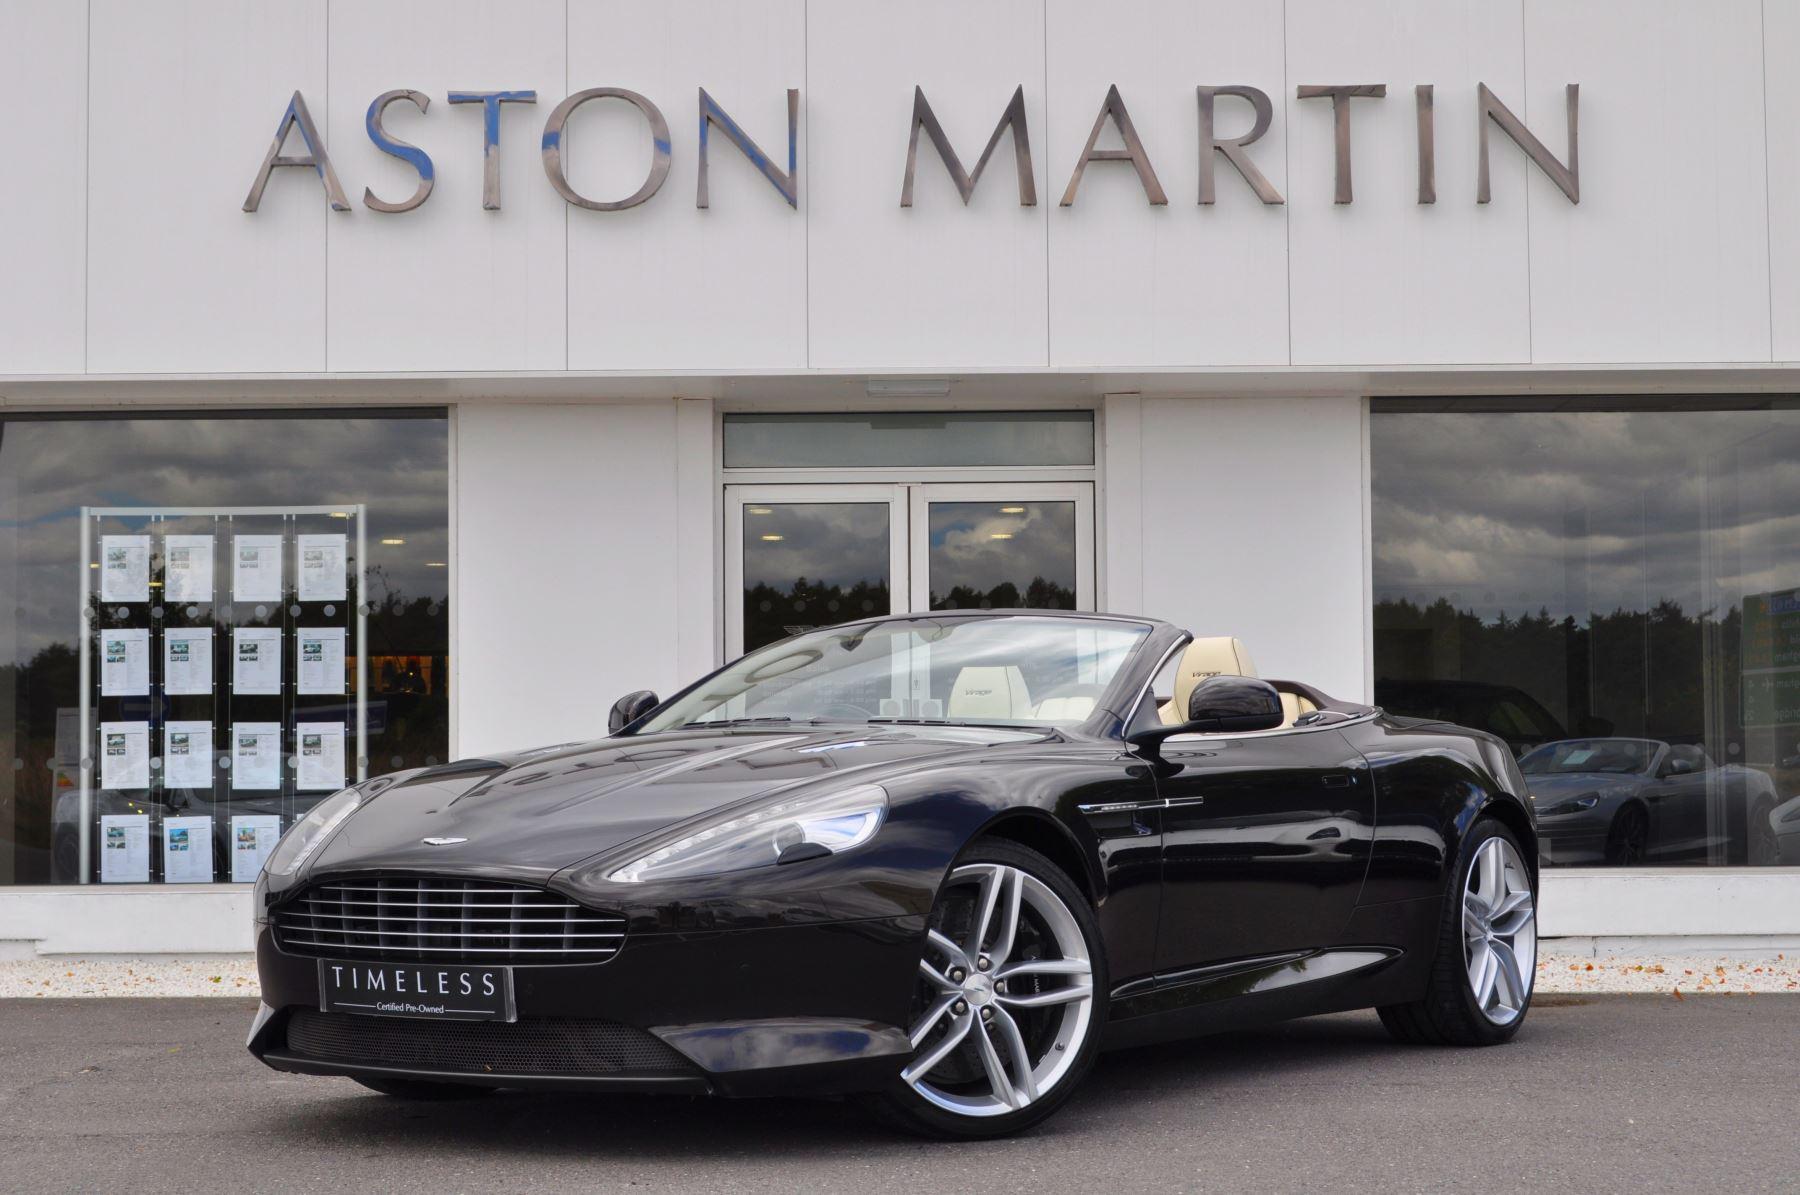 Aston Martin Virage V12 2dr Volante Touchtronic 5.9 Automatic Convertible (2012) image